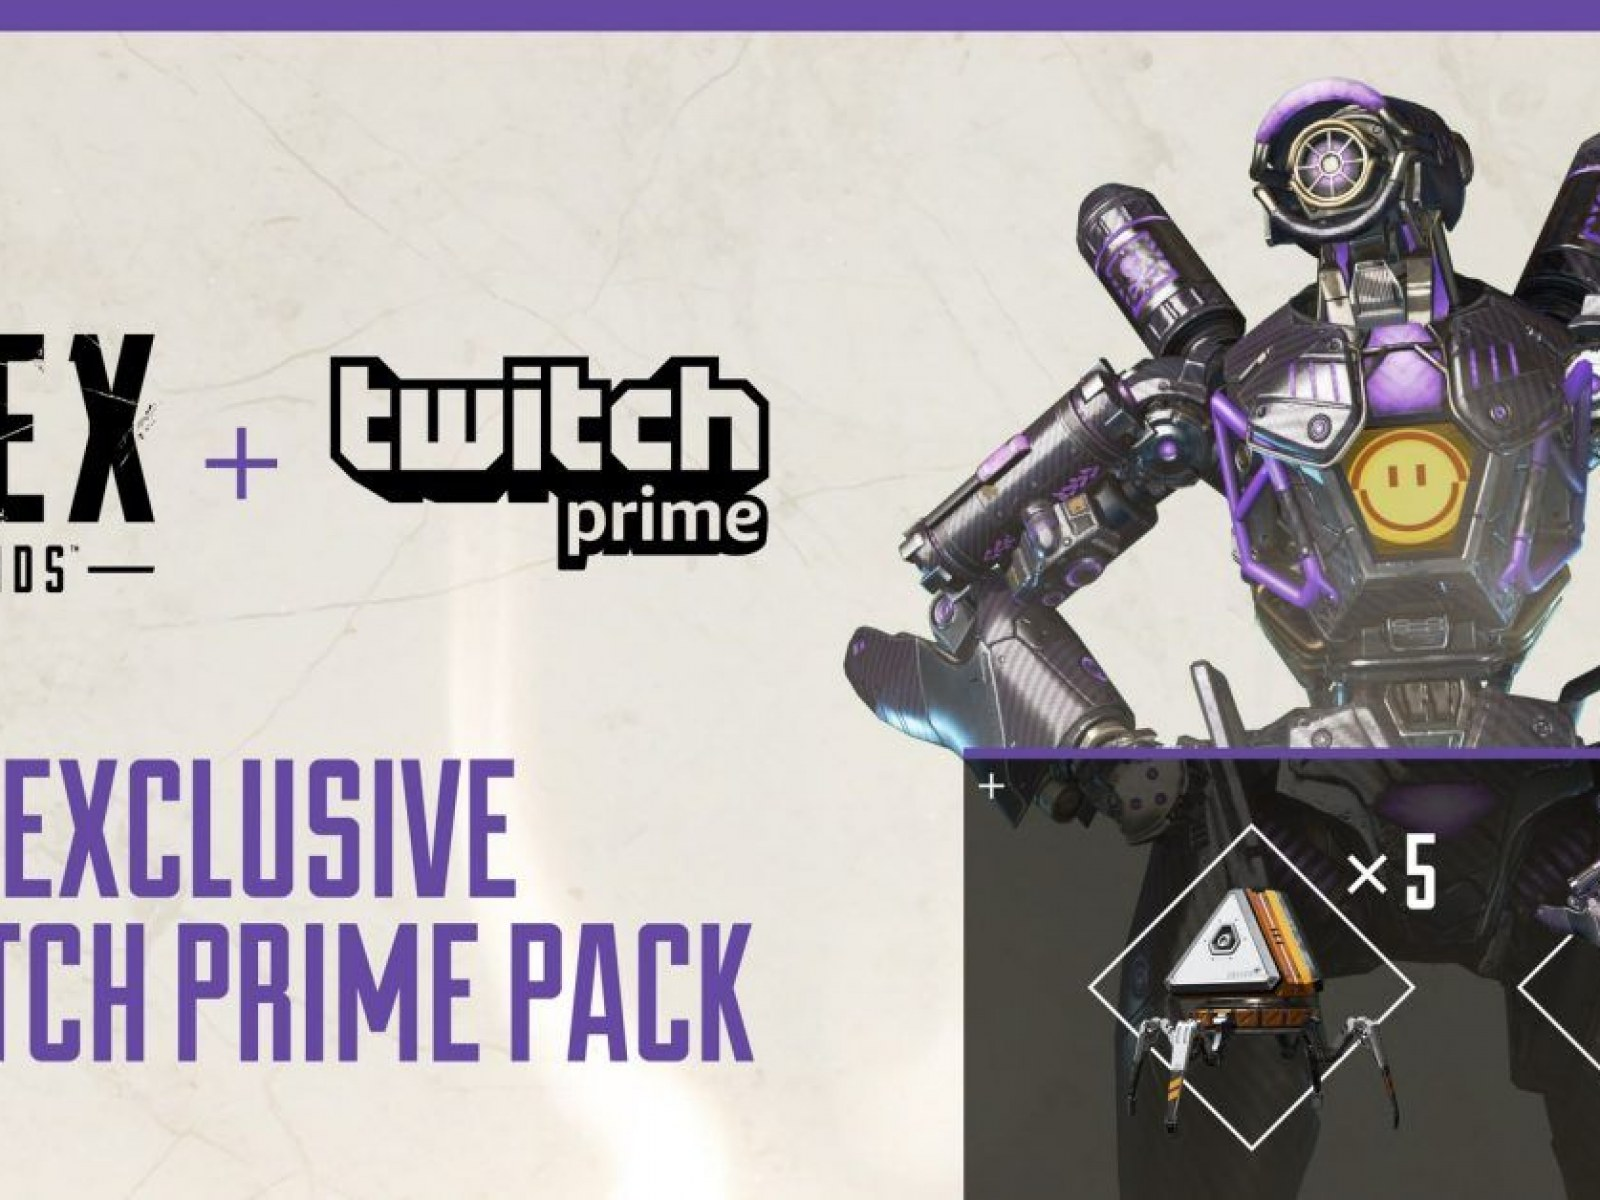 Apex Legends' Twitch Prime Bundle Leaked: Free Pathfinder Skin and